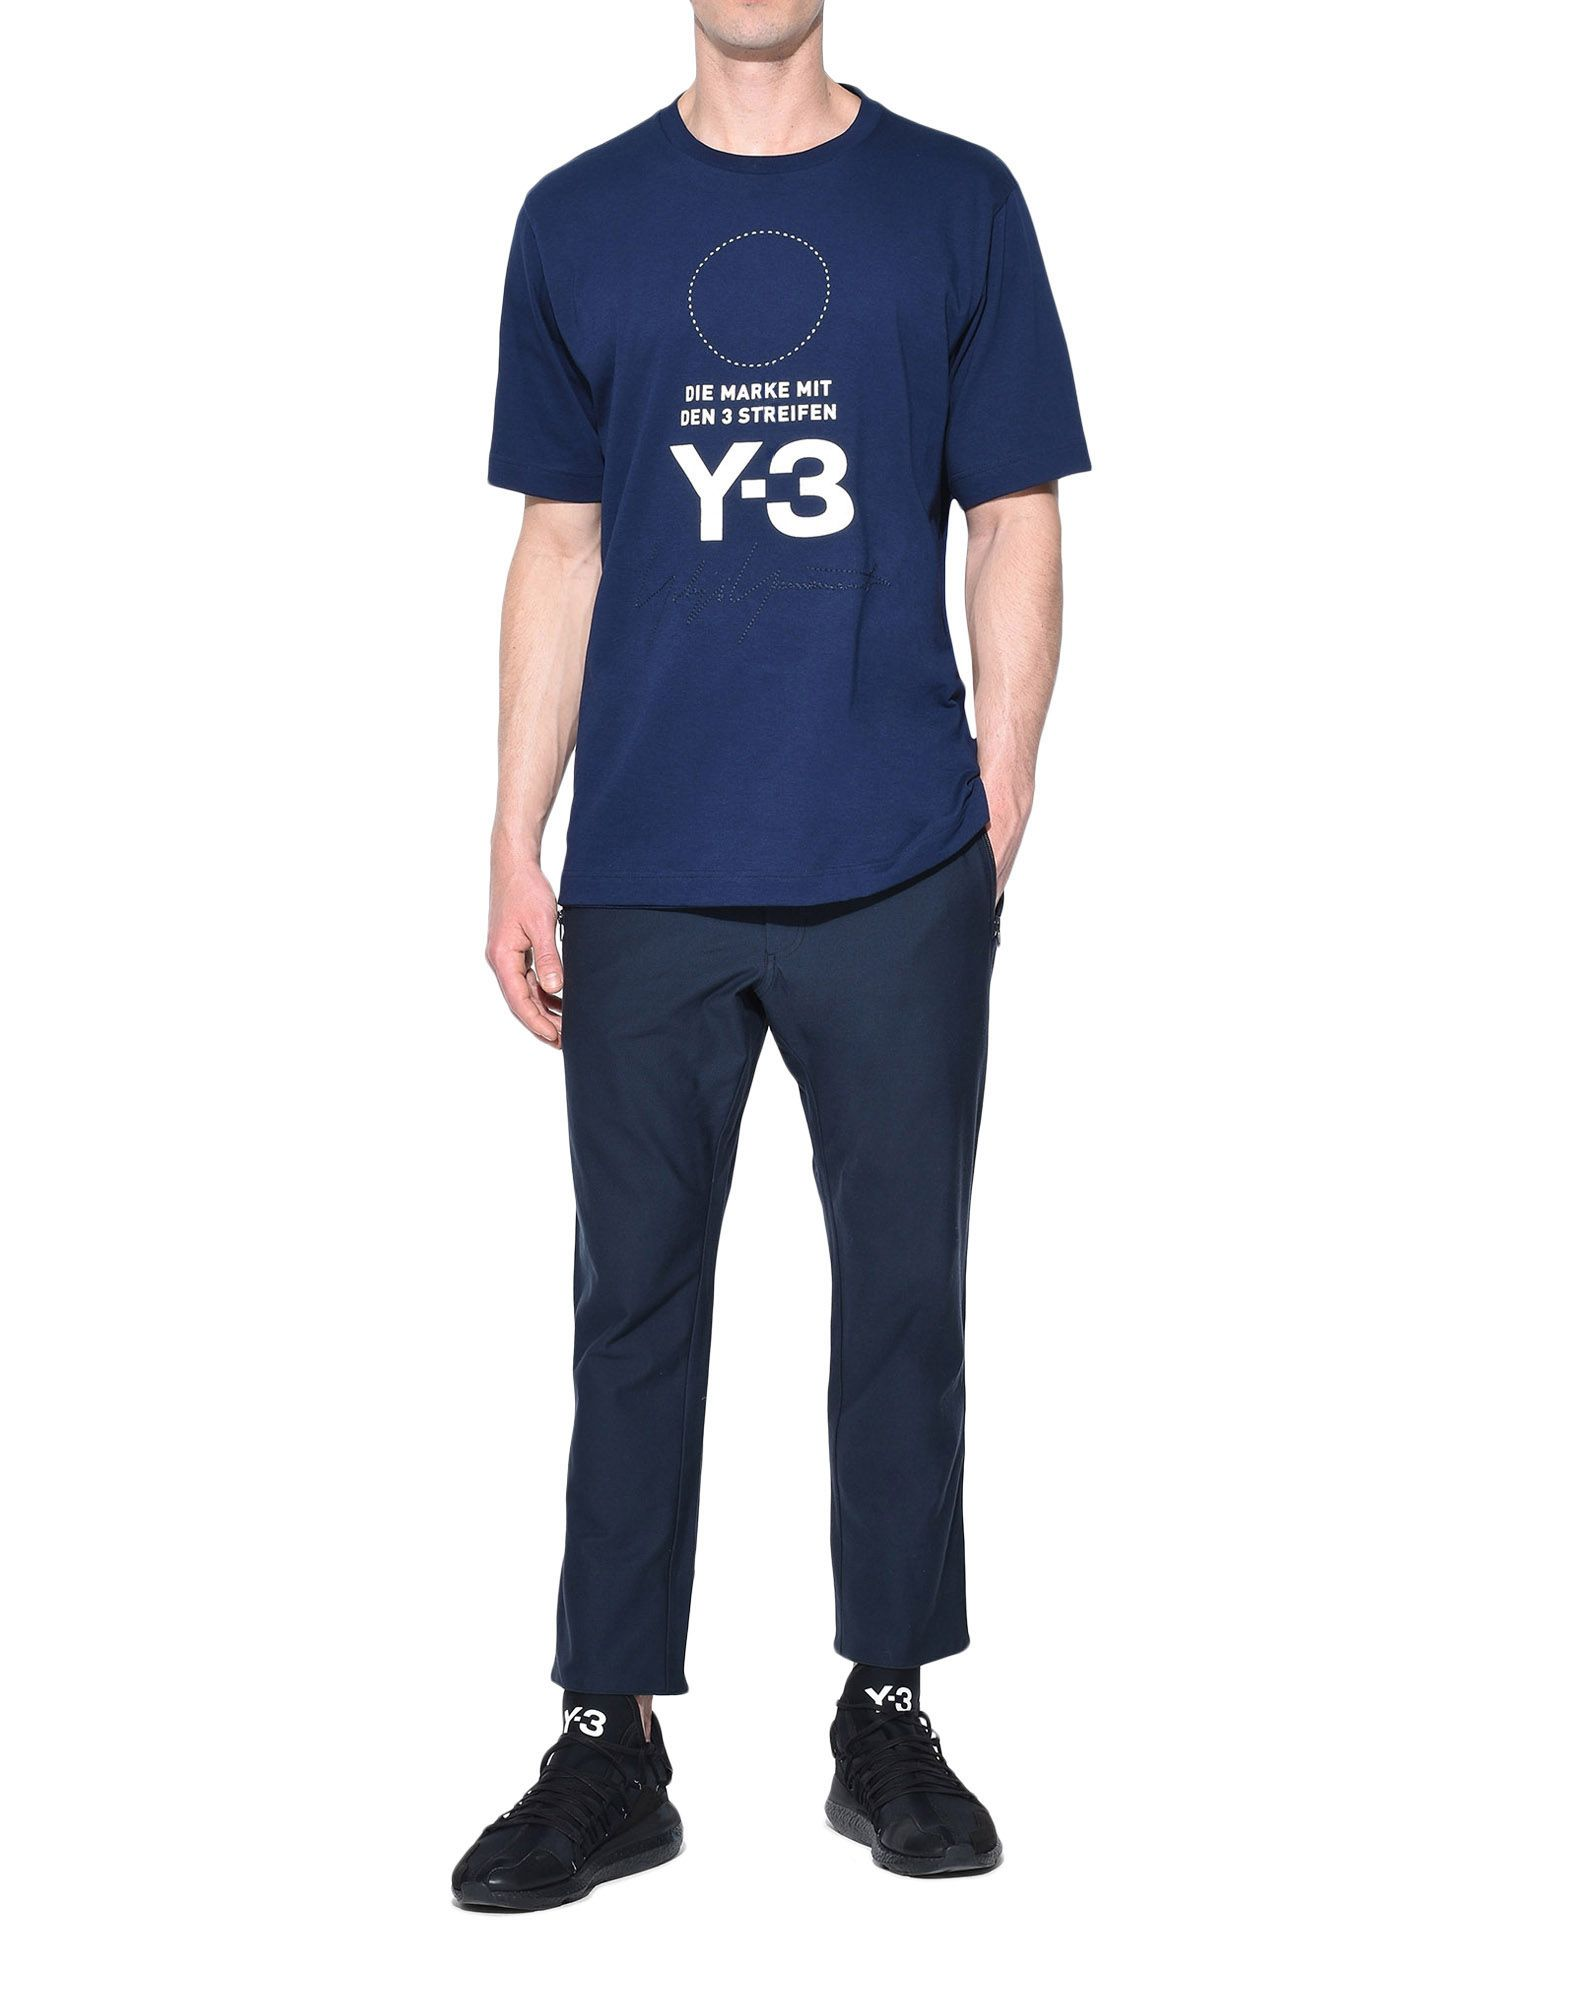 Y-3 Y-3 Twill Cropped Pants dreiviertellange Hose Herren a